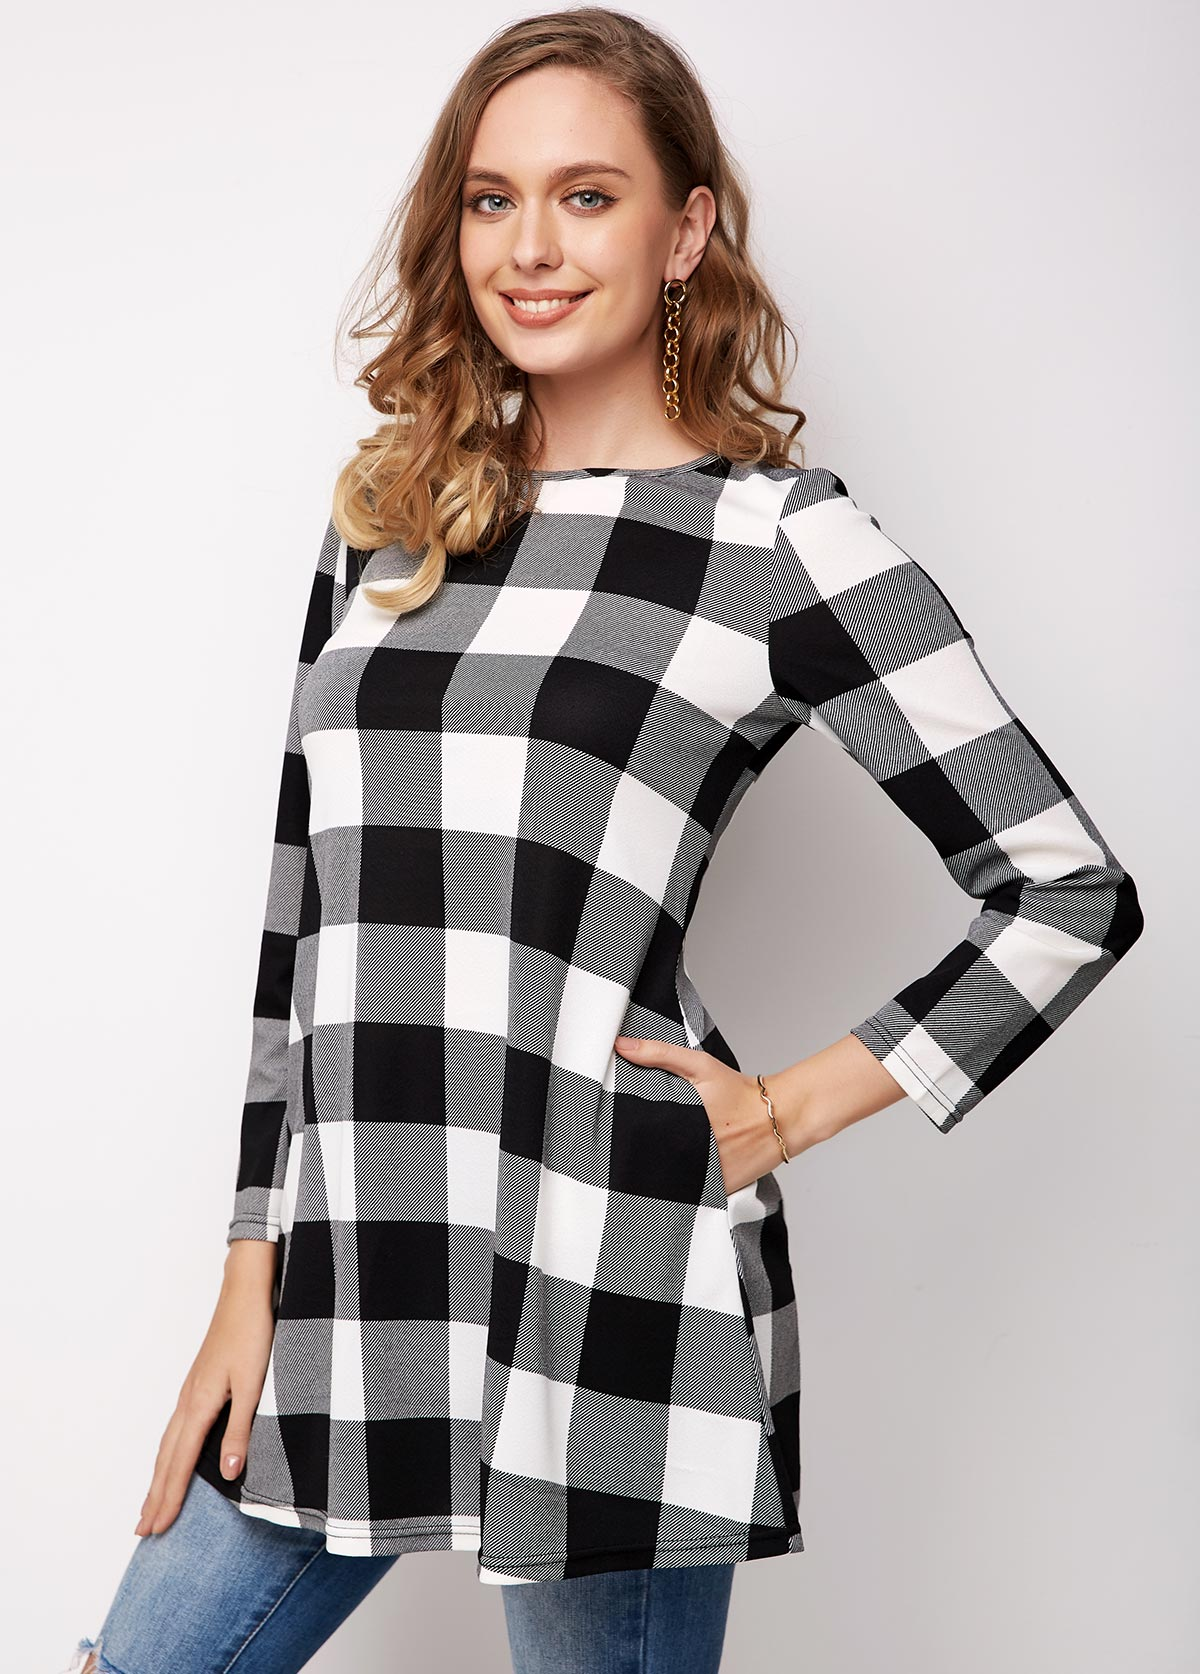 ROTITA Long Sleeve Plaid Round Neck Pocket T Shirt